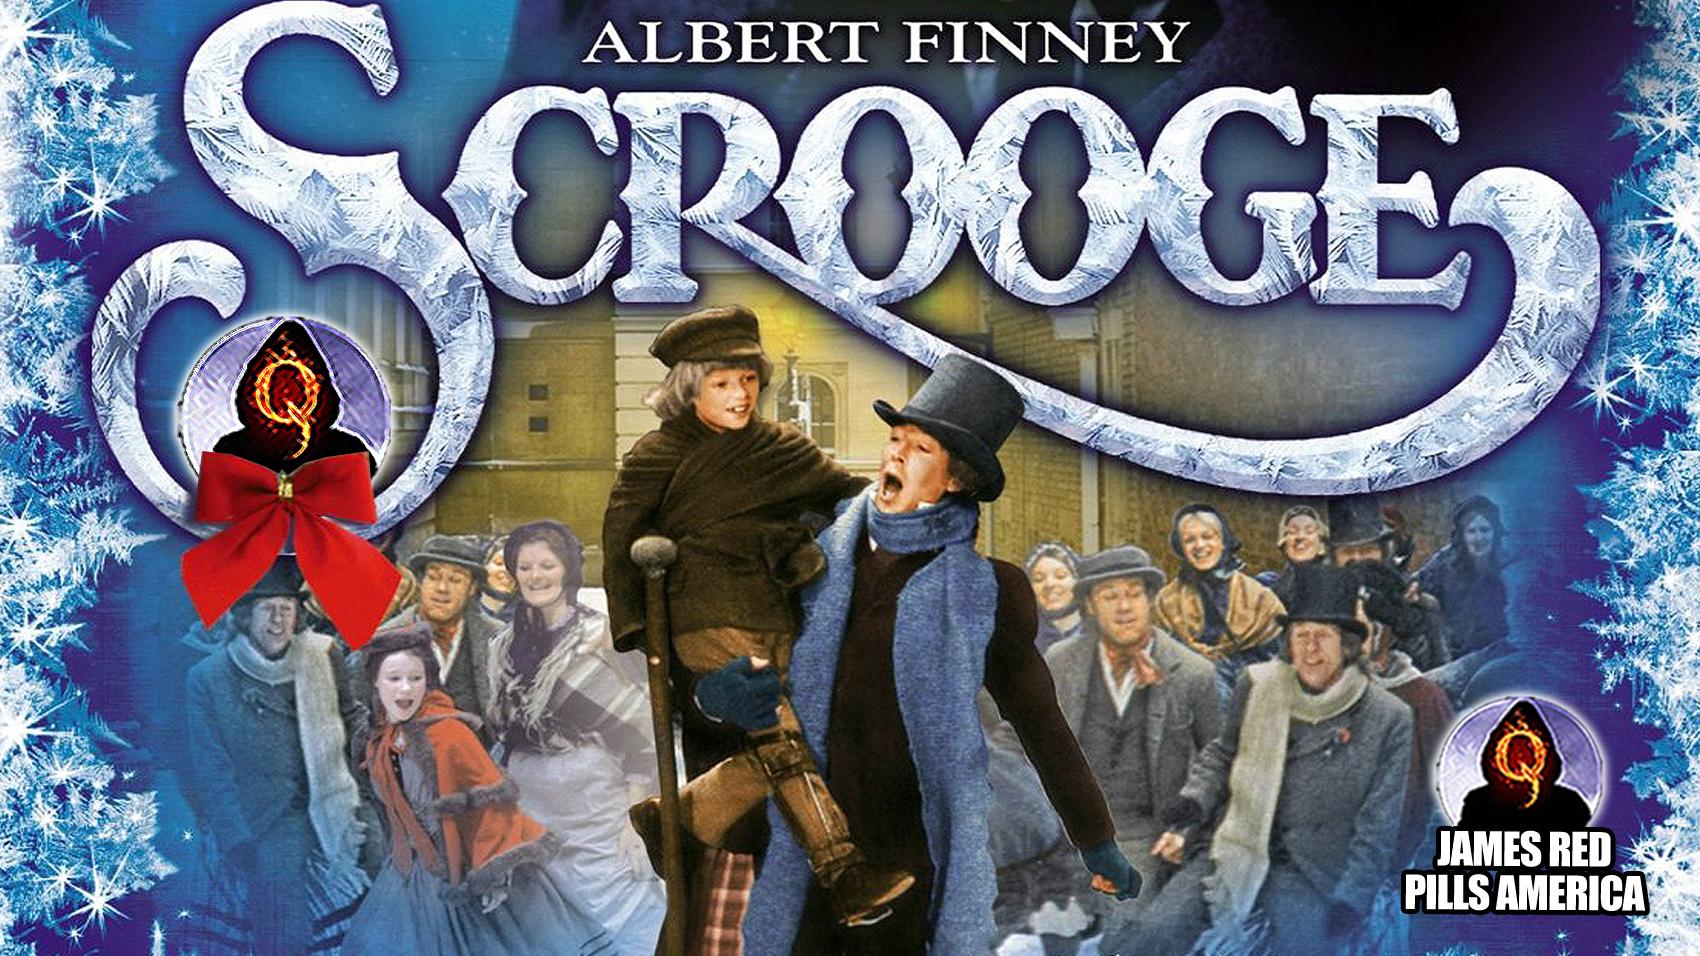 SCROOGE - Based on 'A Christmas Carol' by Charles Dickens - [FULL HD ORIGINAL 1970 MOVIE ...